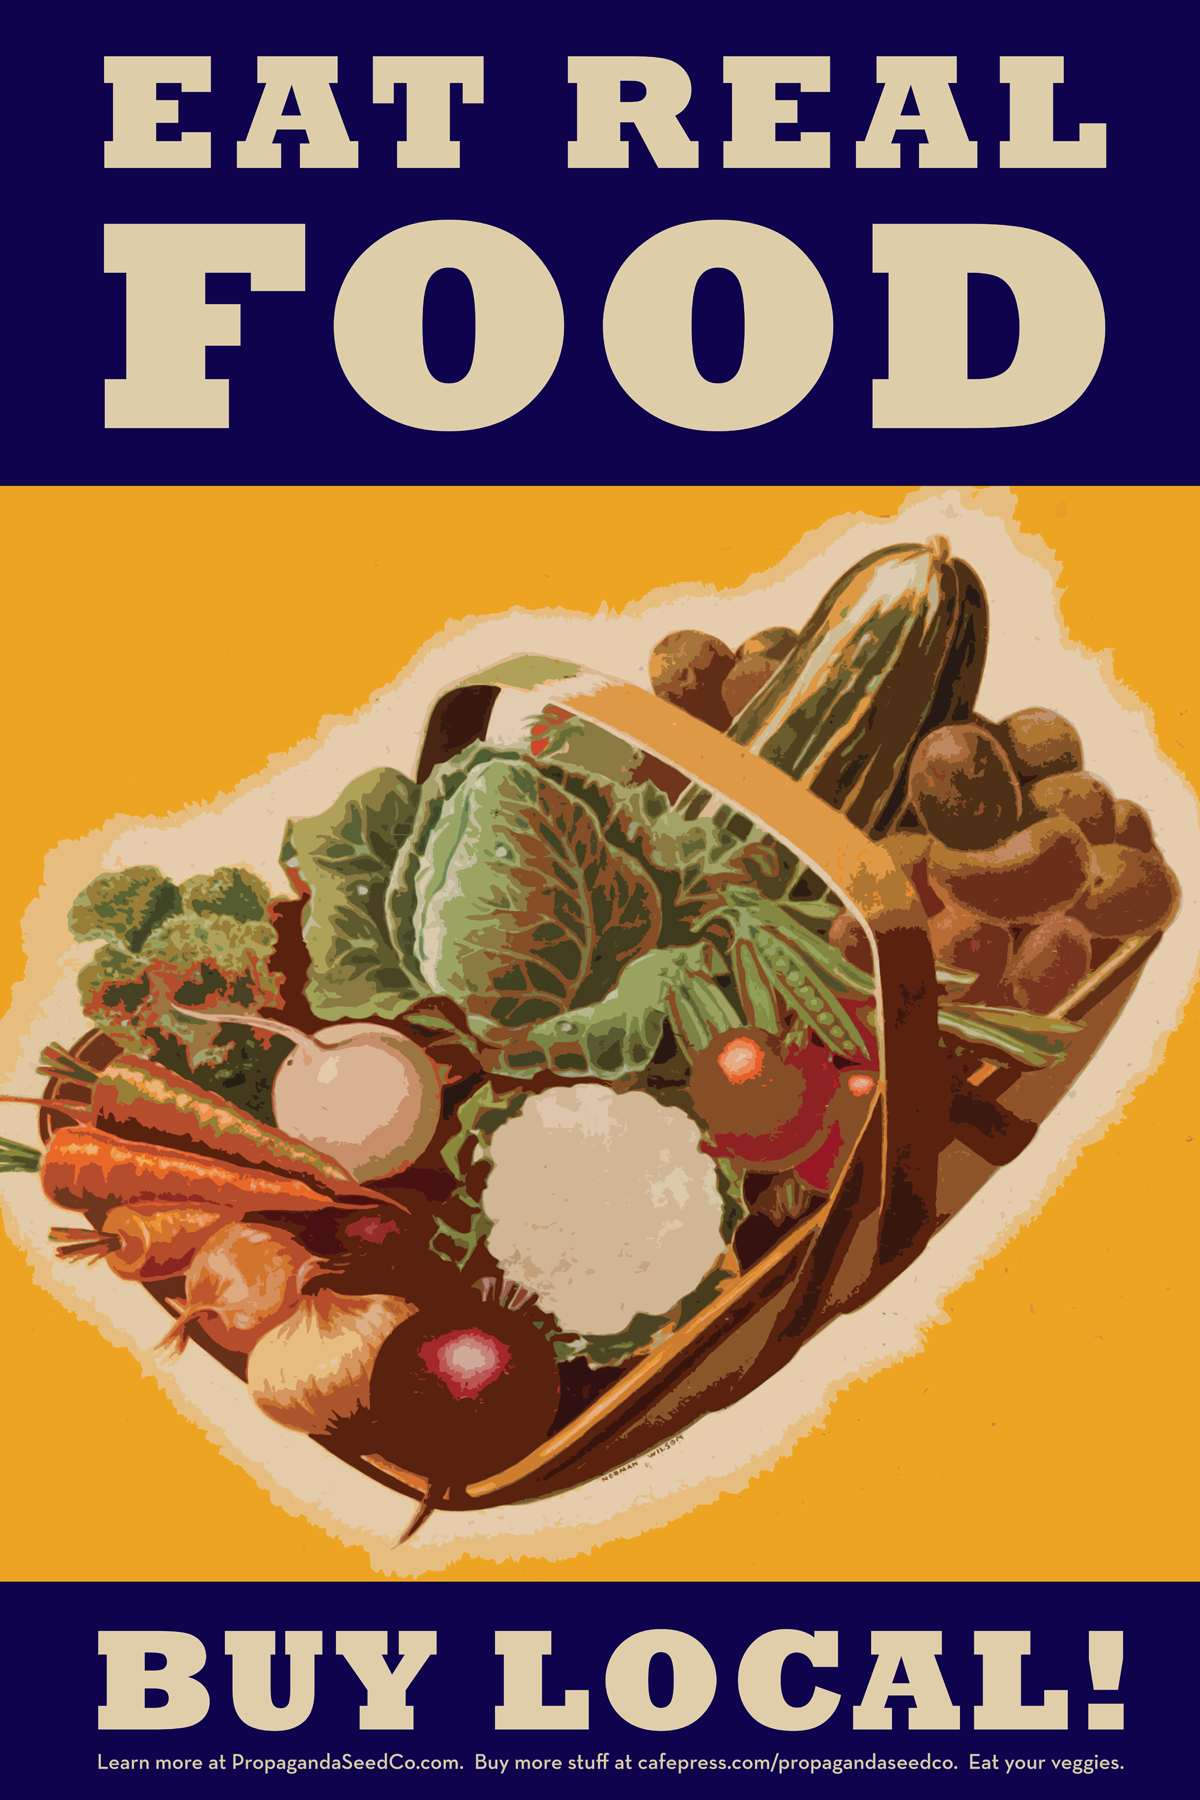 Food propaganda's my new fave